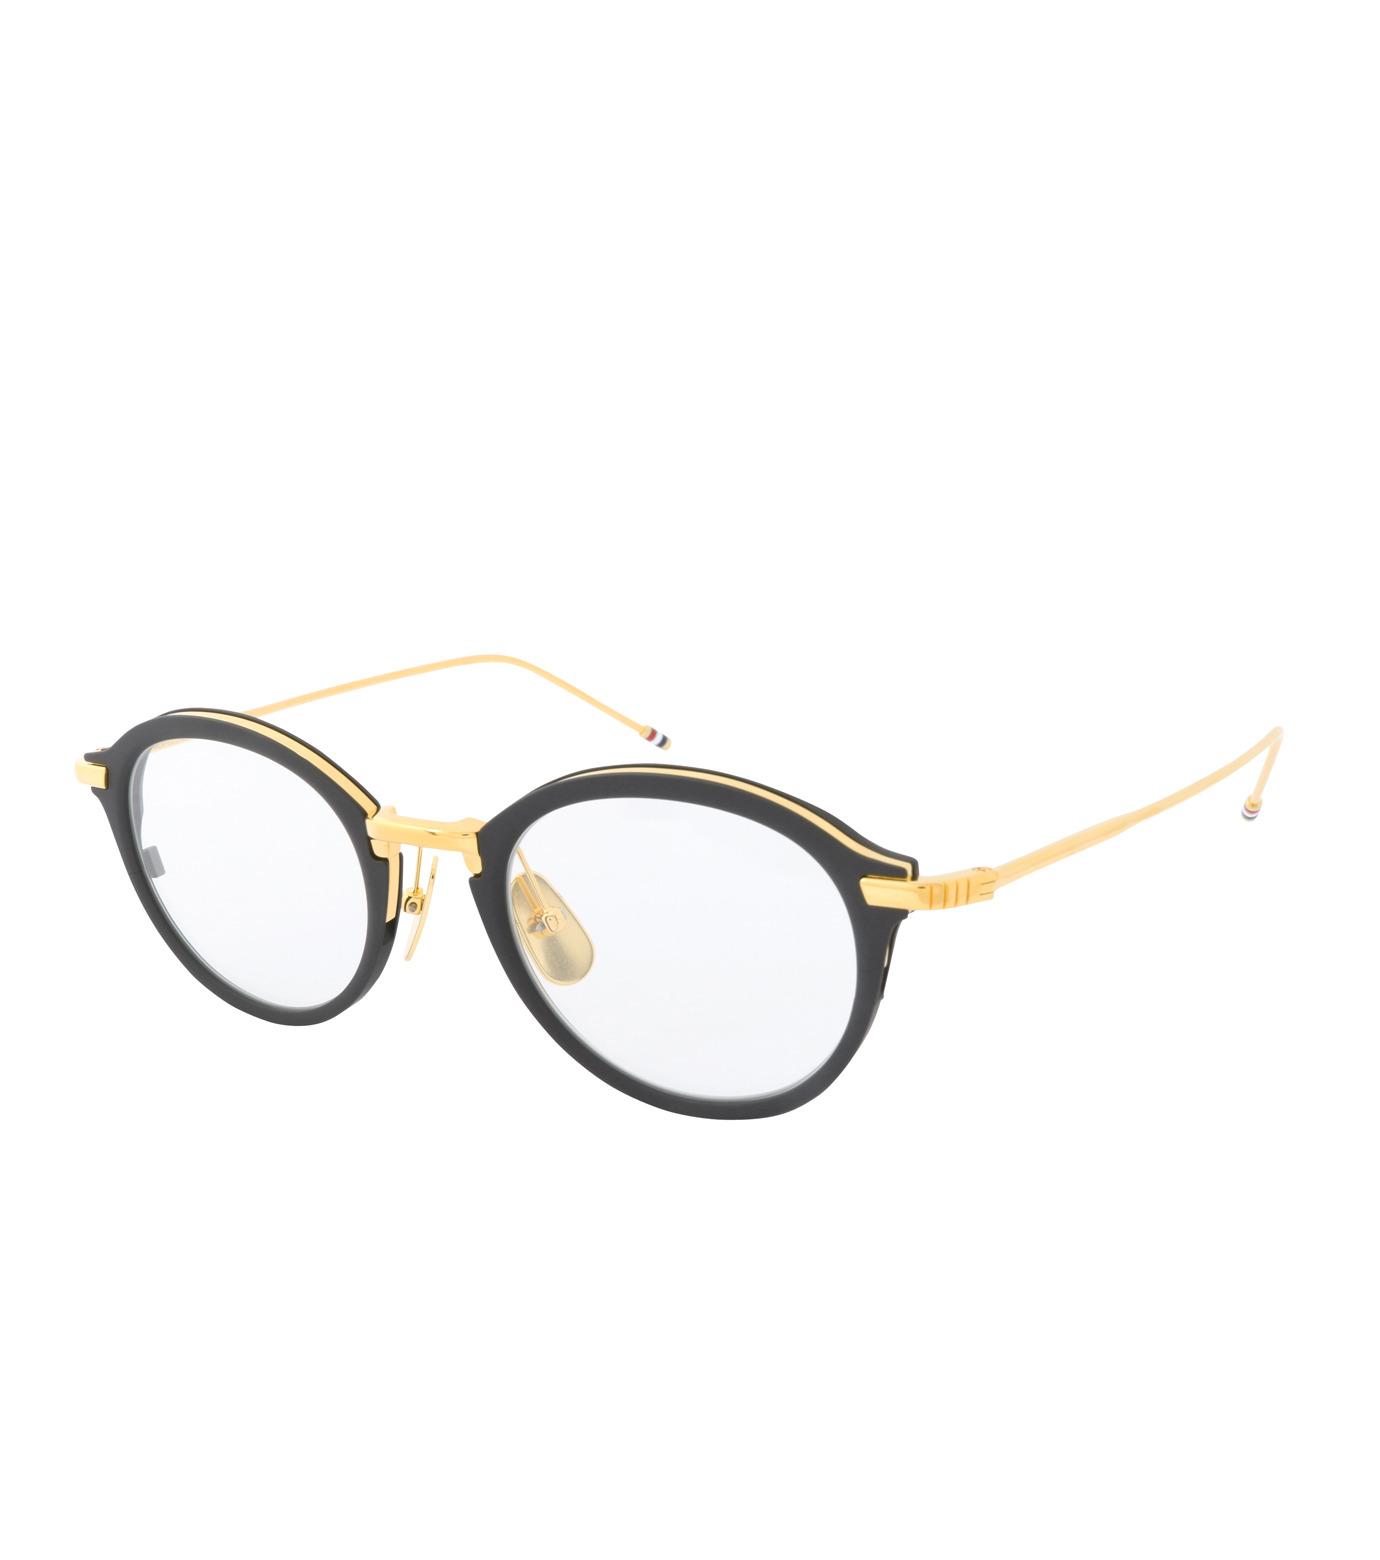 Thom Browne Eye Wear(トム・ブラウン・アイウェア)のRound Clear Lens-BLACK(アイウェア/eyewear)-TB-110-A-13 拡大詳細画像1